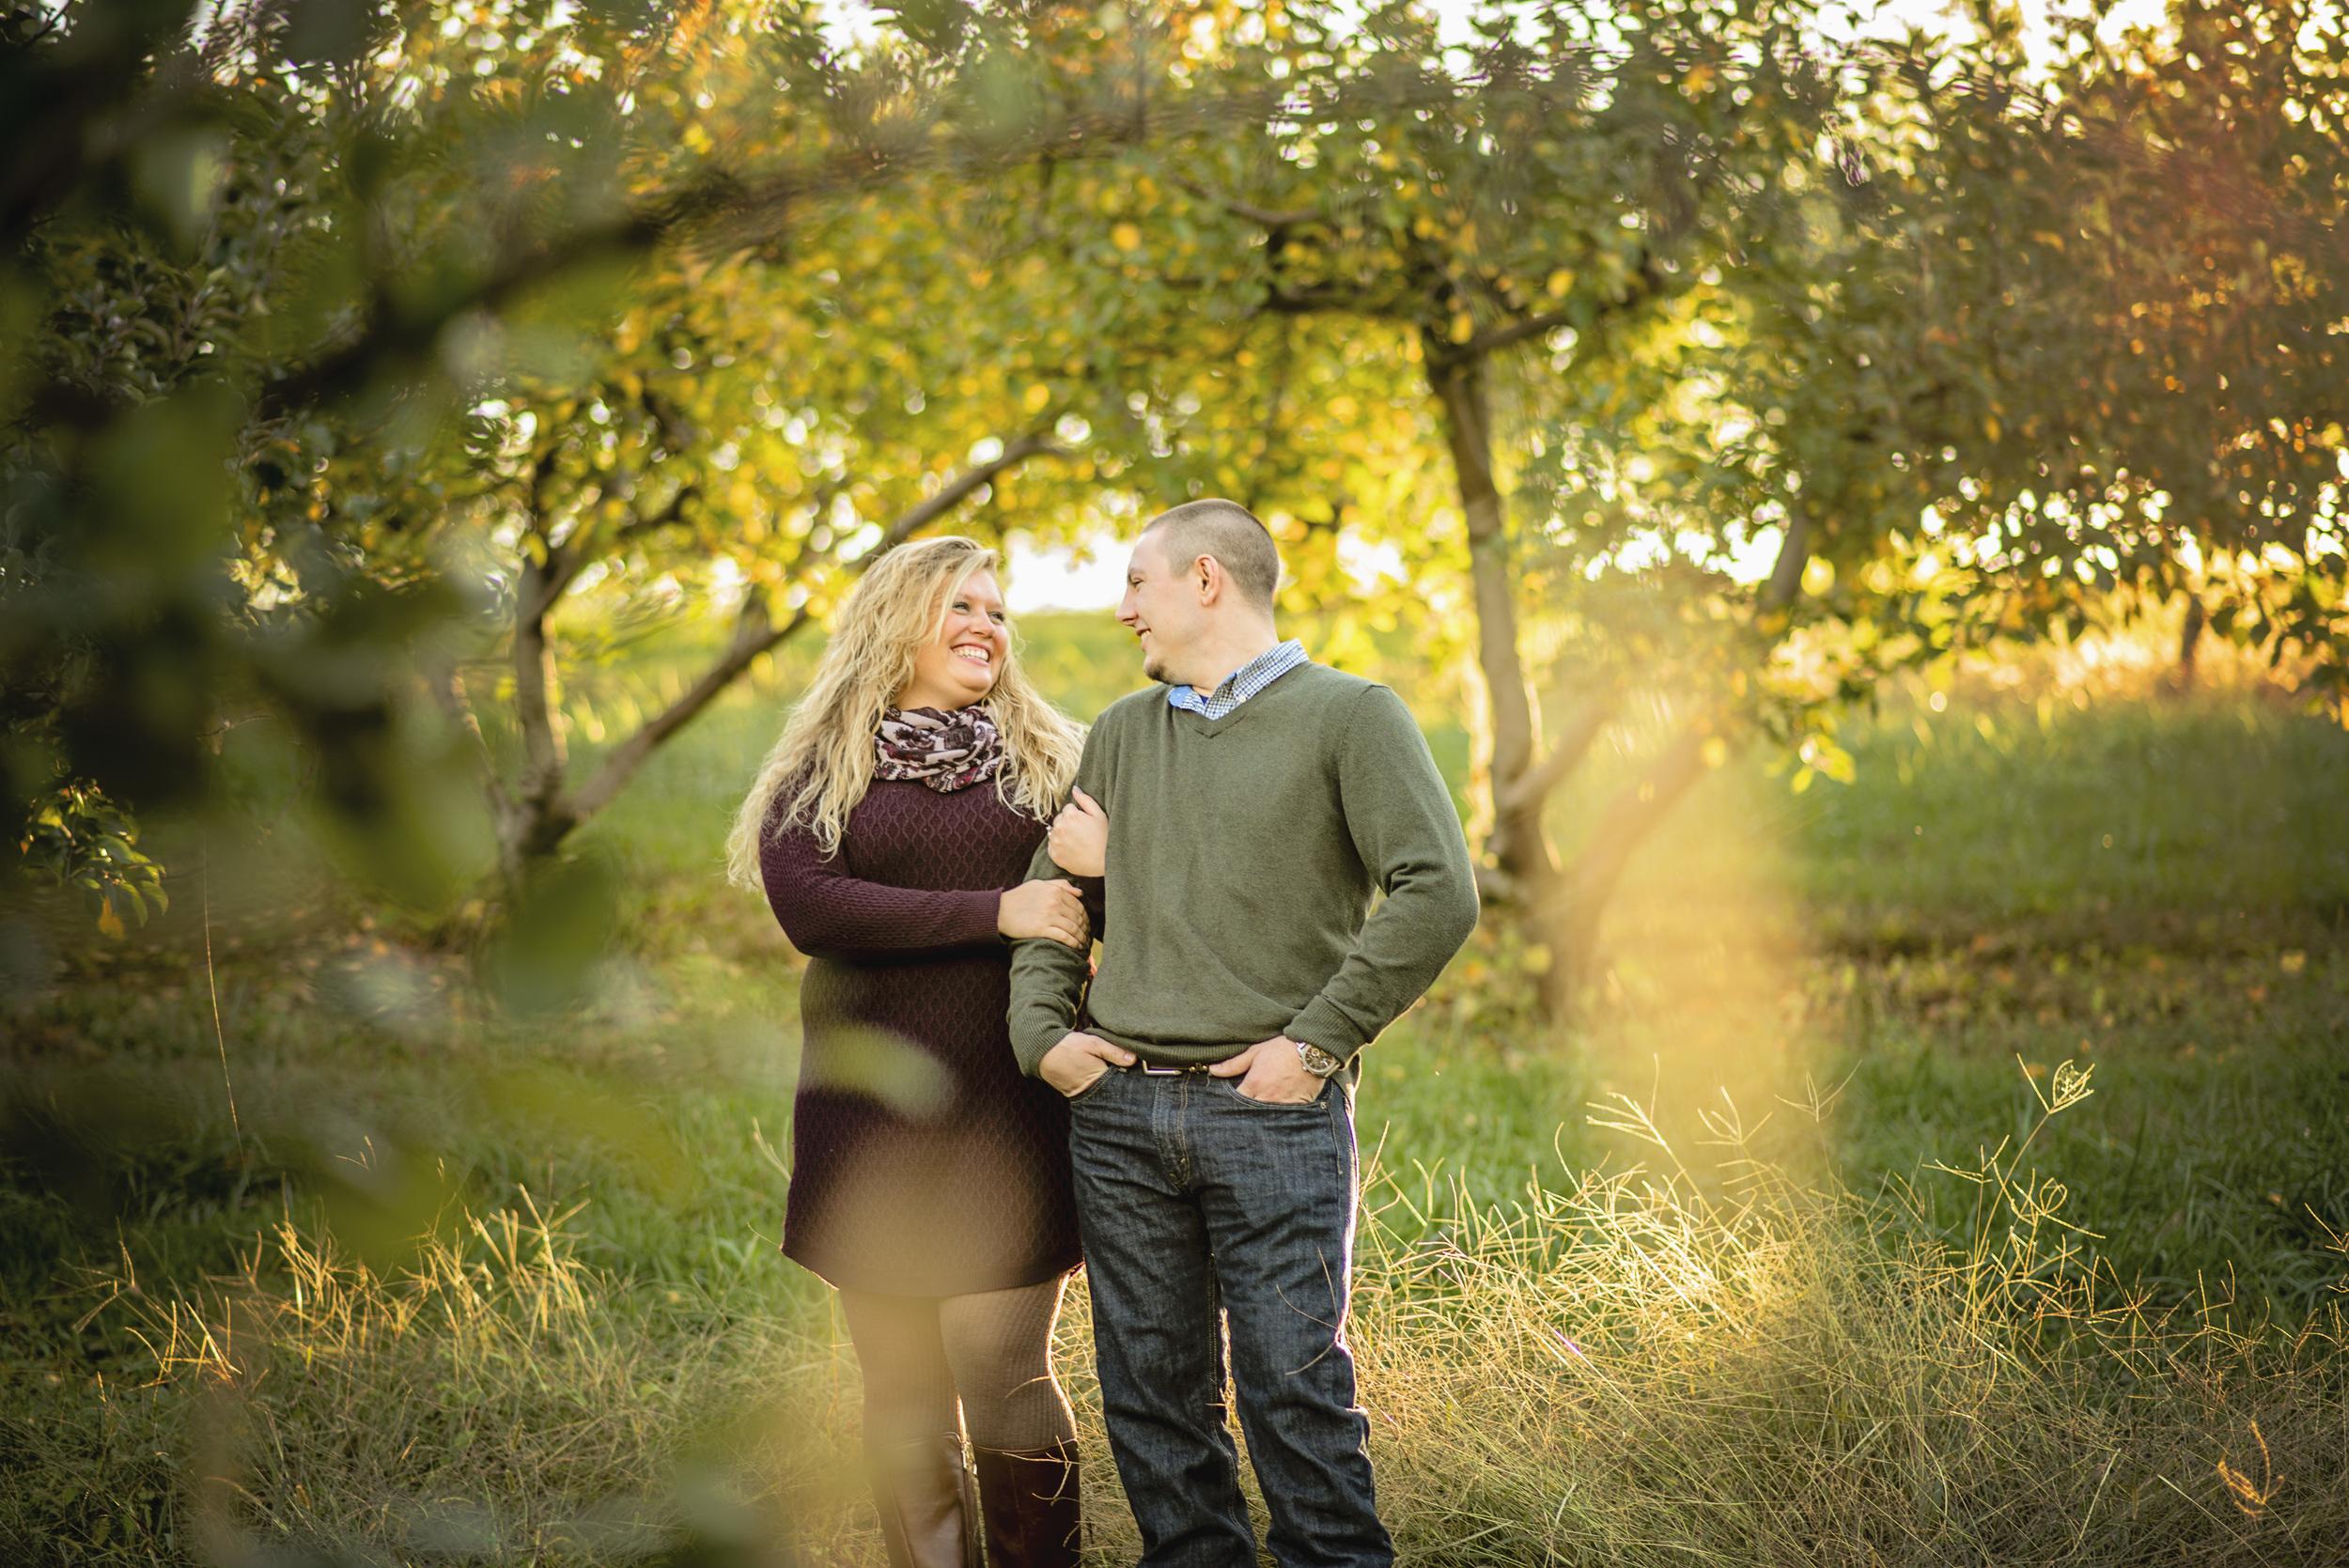 fall_romantic_orchard_engagement_session_lynchburg_va004.jpg